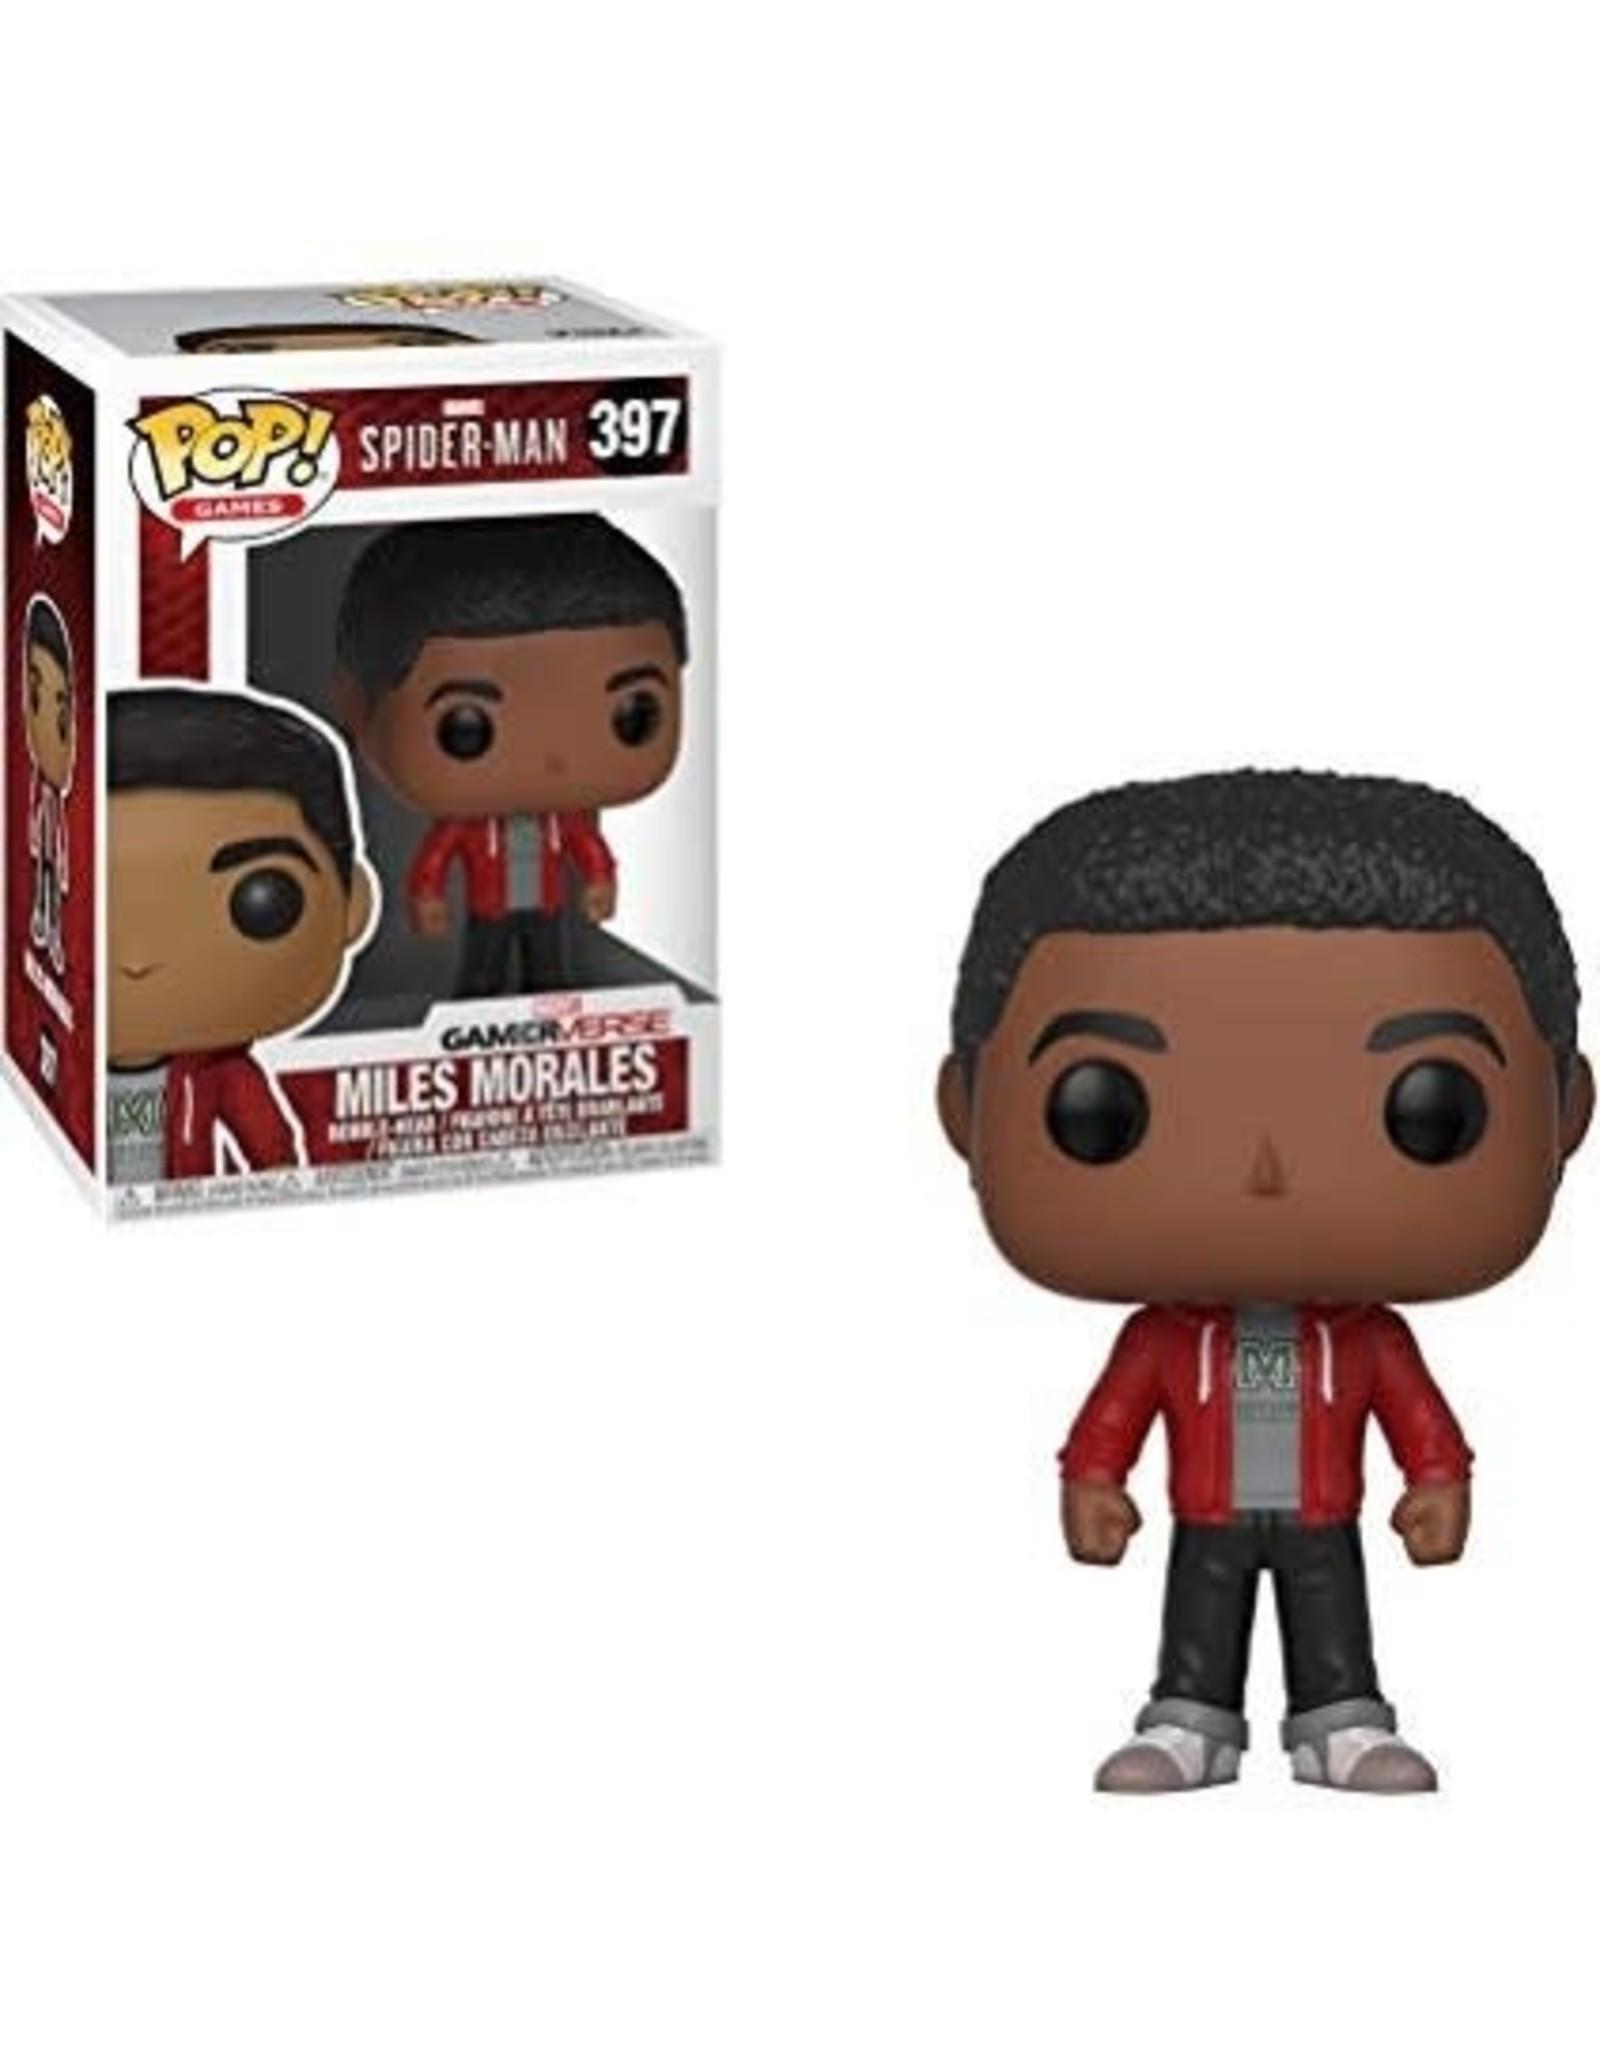 Funko Pop! Funko Pop! Games nr397 Miles Morales